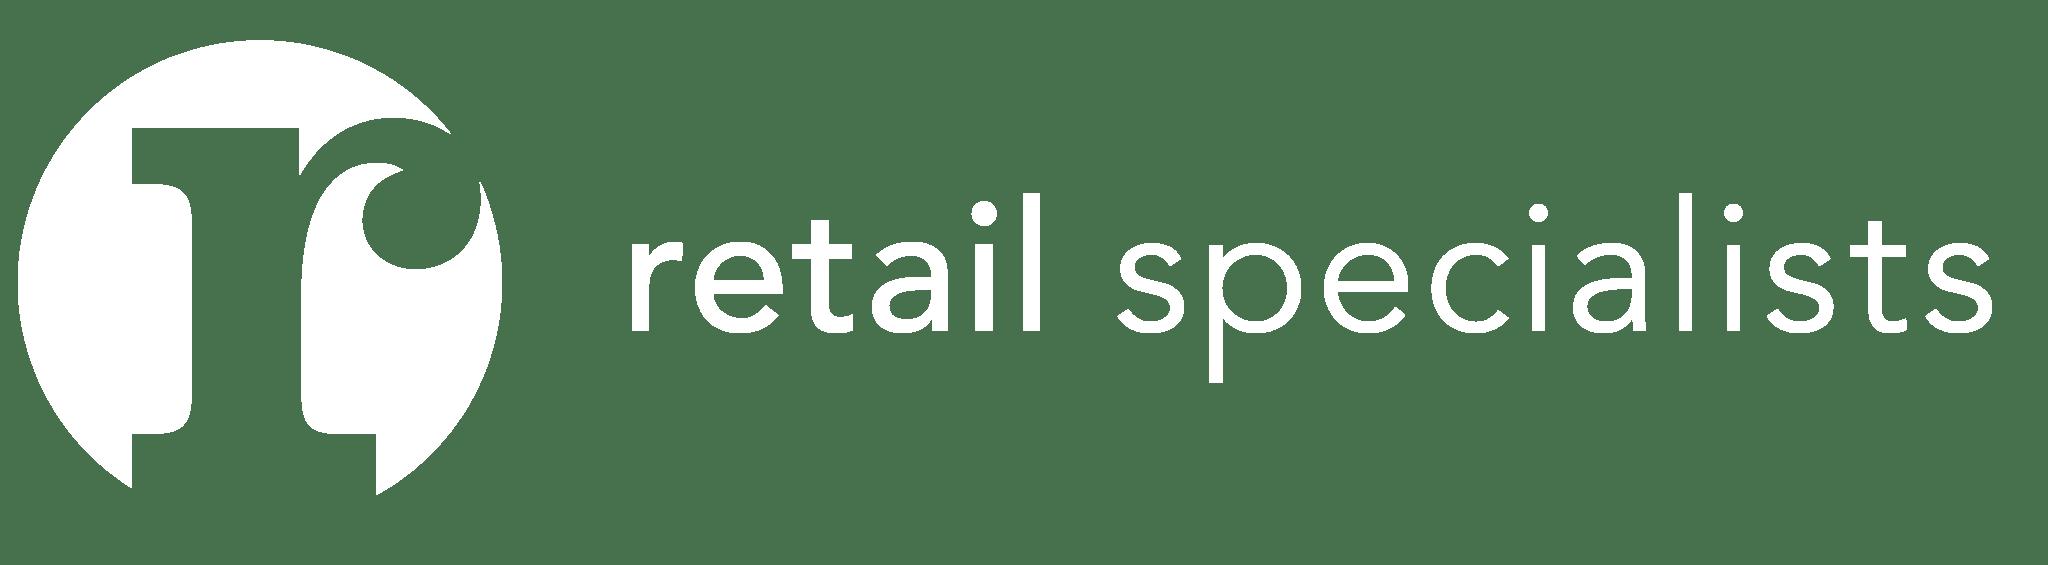 RETAIL SPECIALISTS